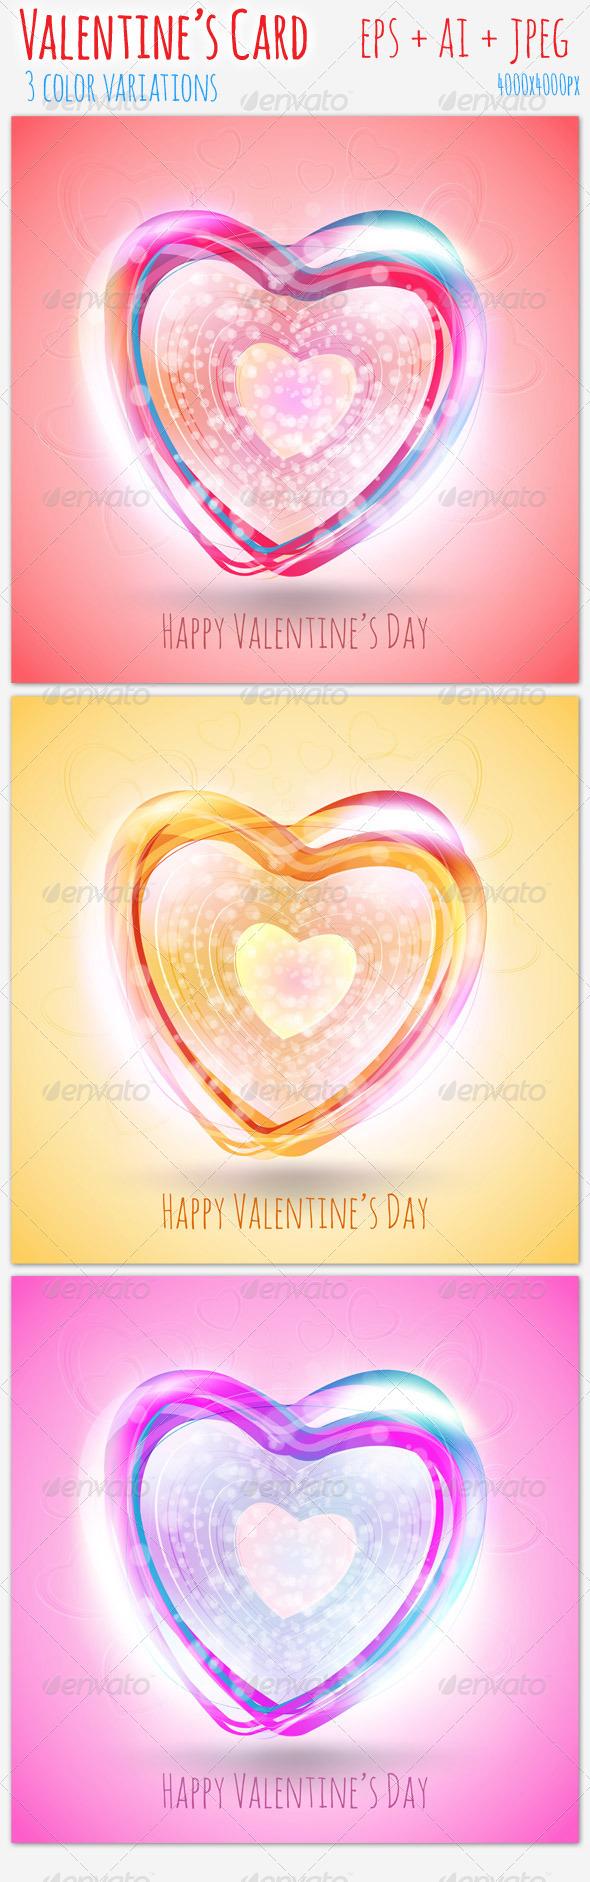 GraphicRiver Valentine s Card 01 3754527